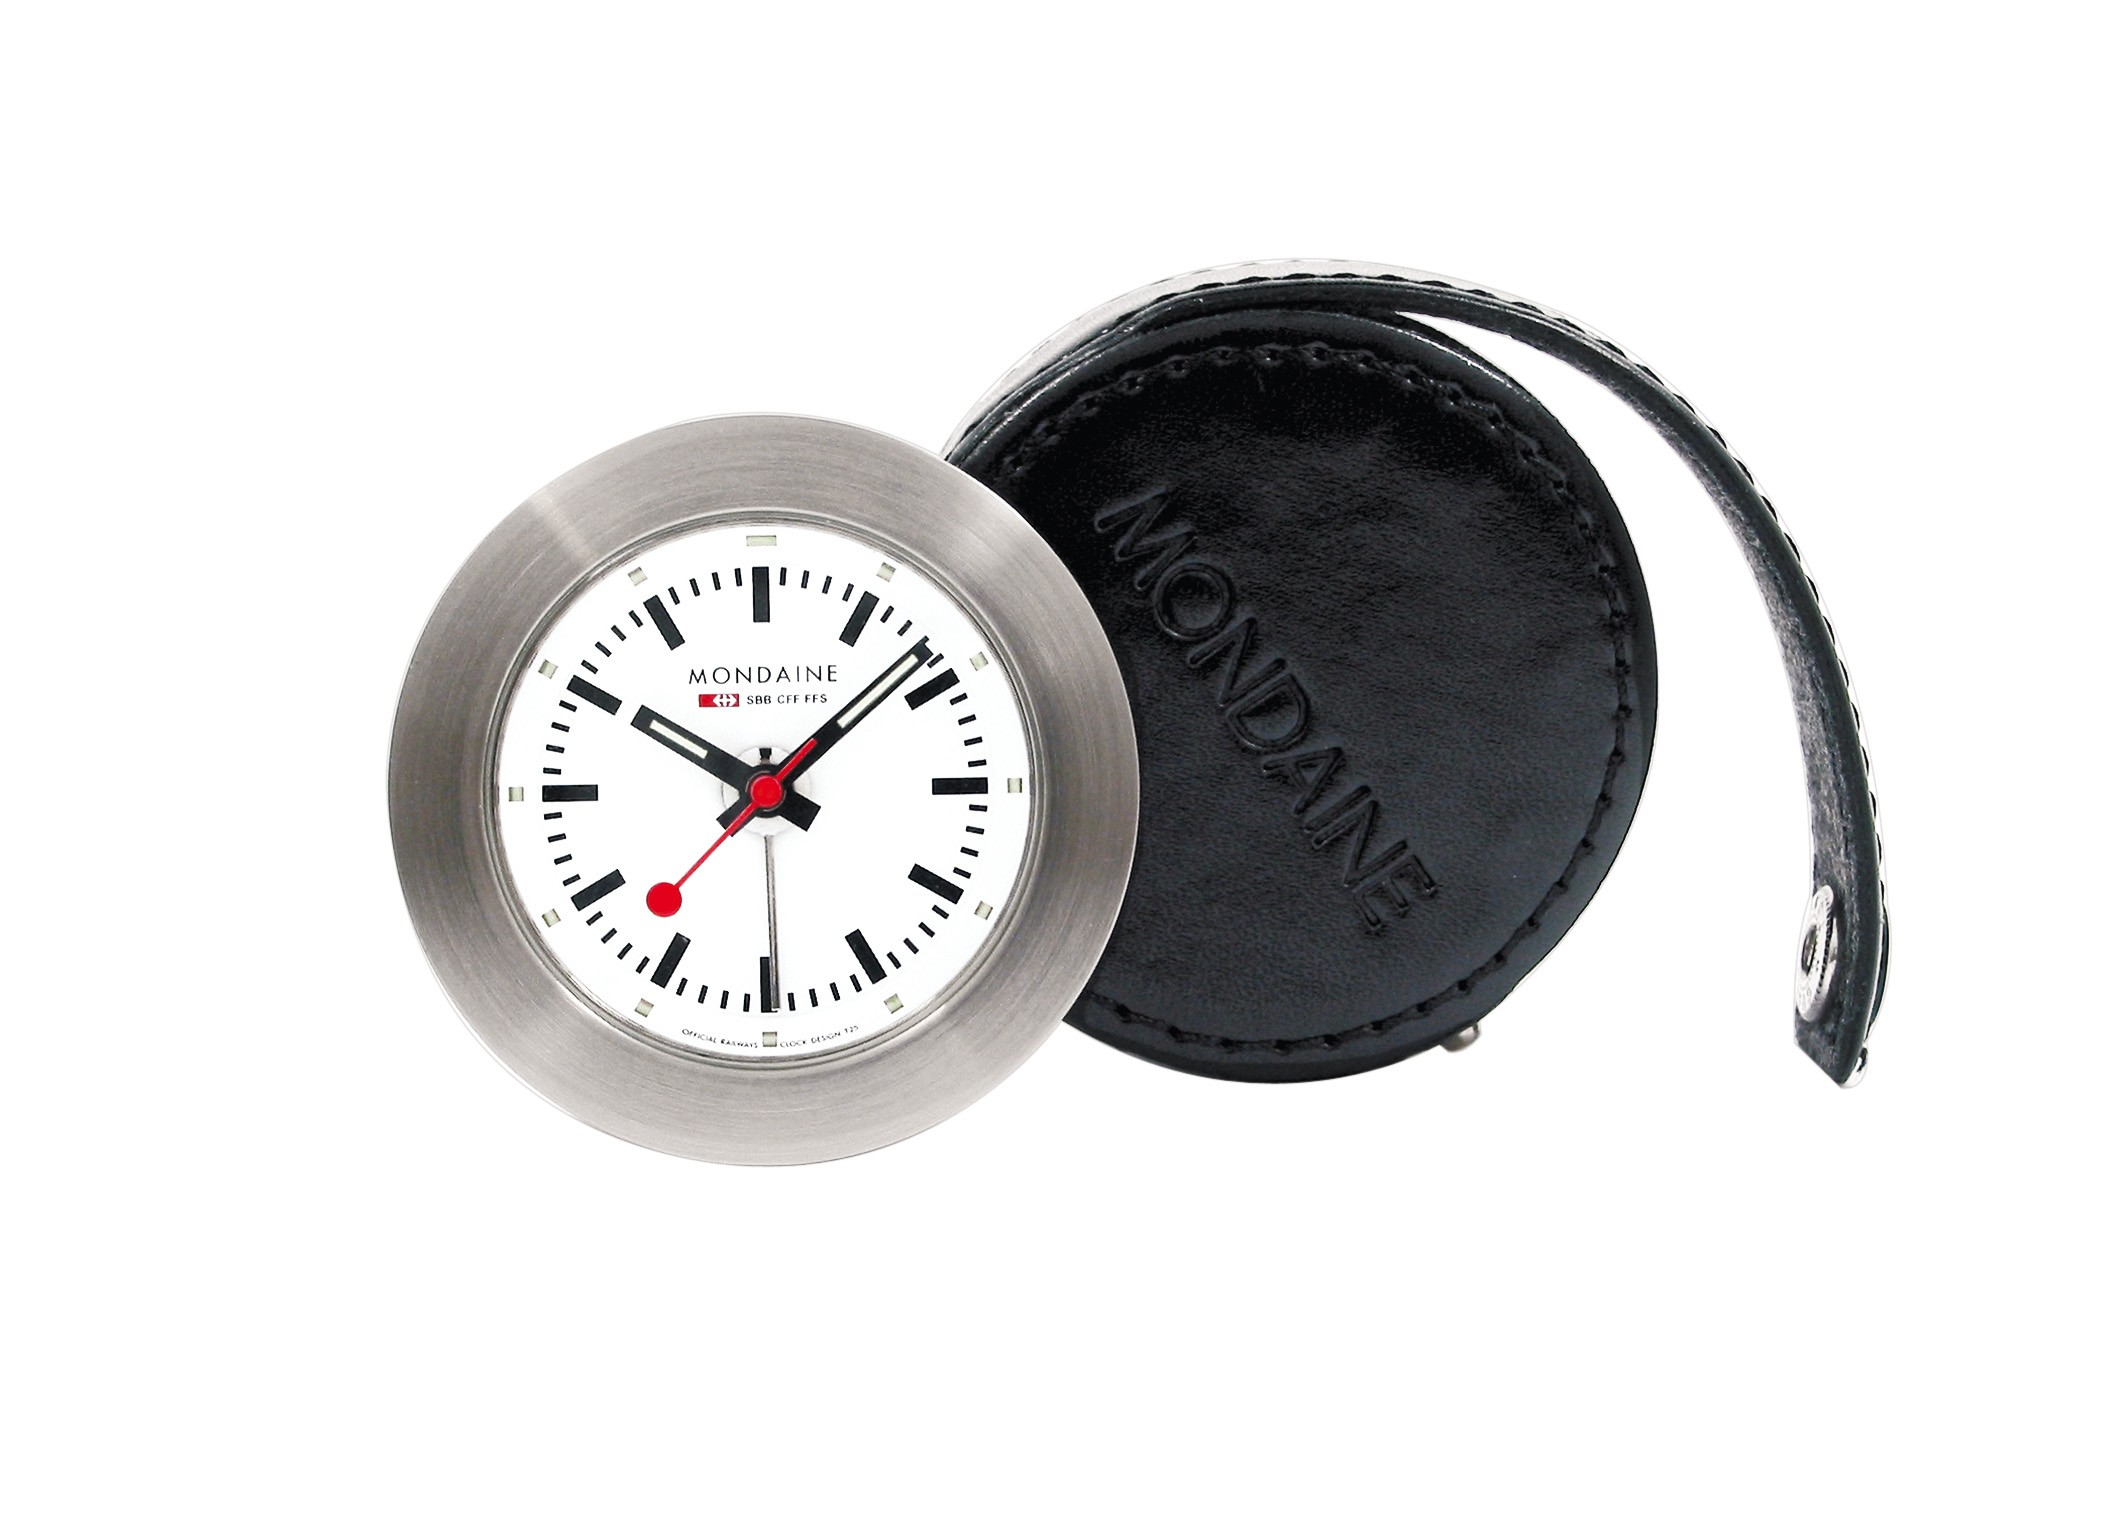 Mondaine swiss watch ALARM CLOCK NIGHT VISION - A992.TRUK.16SBB